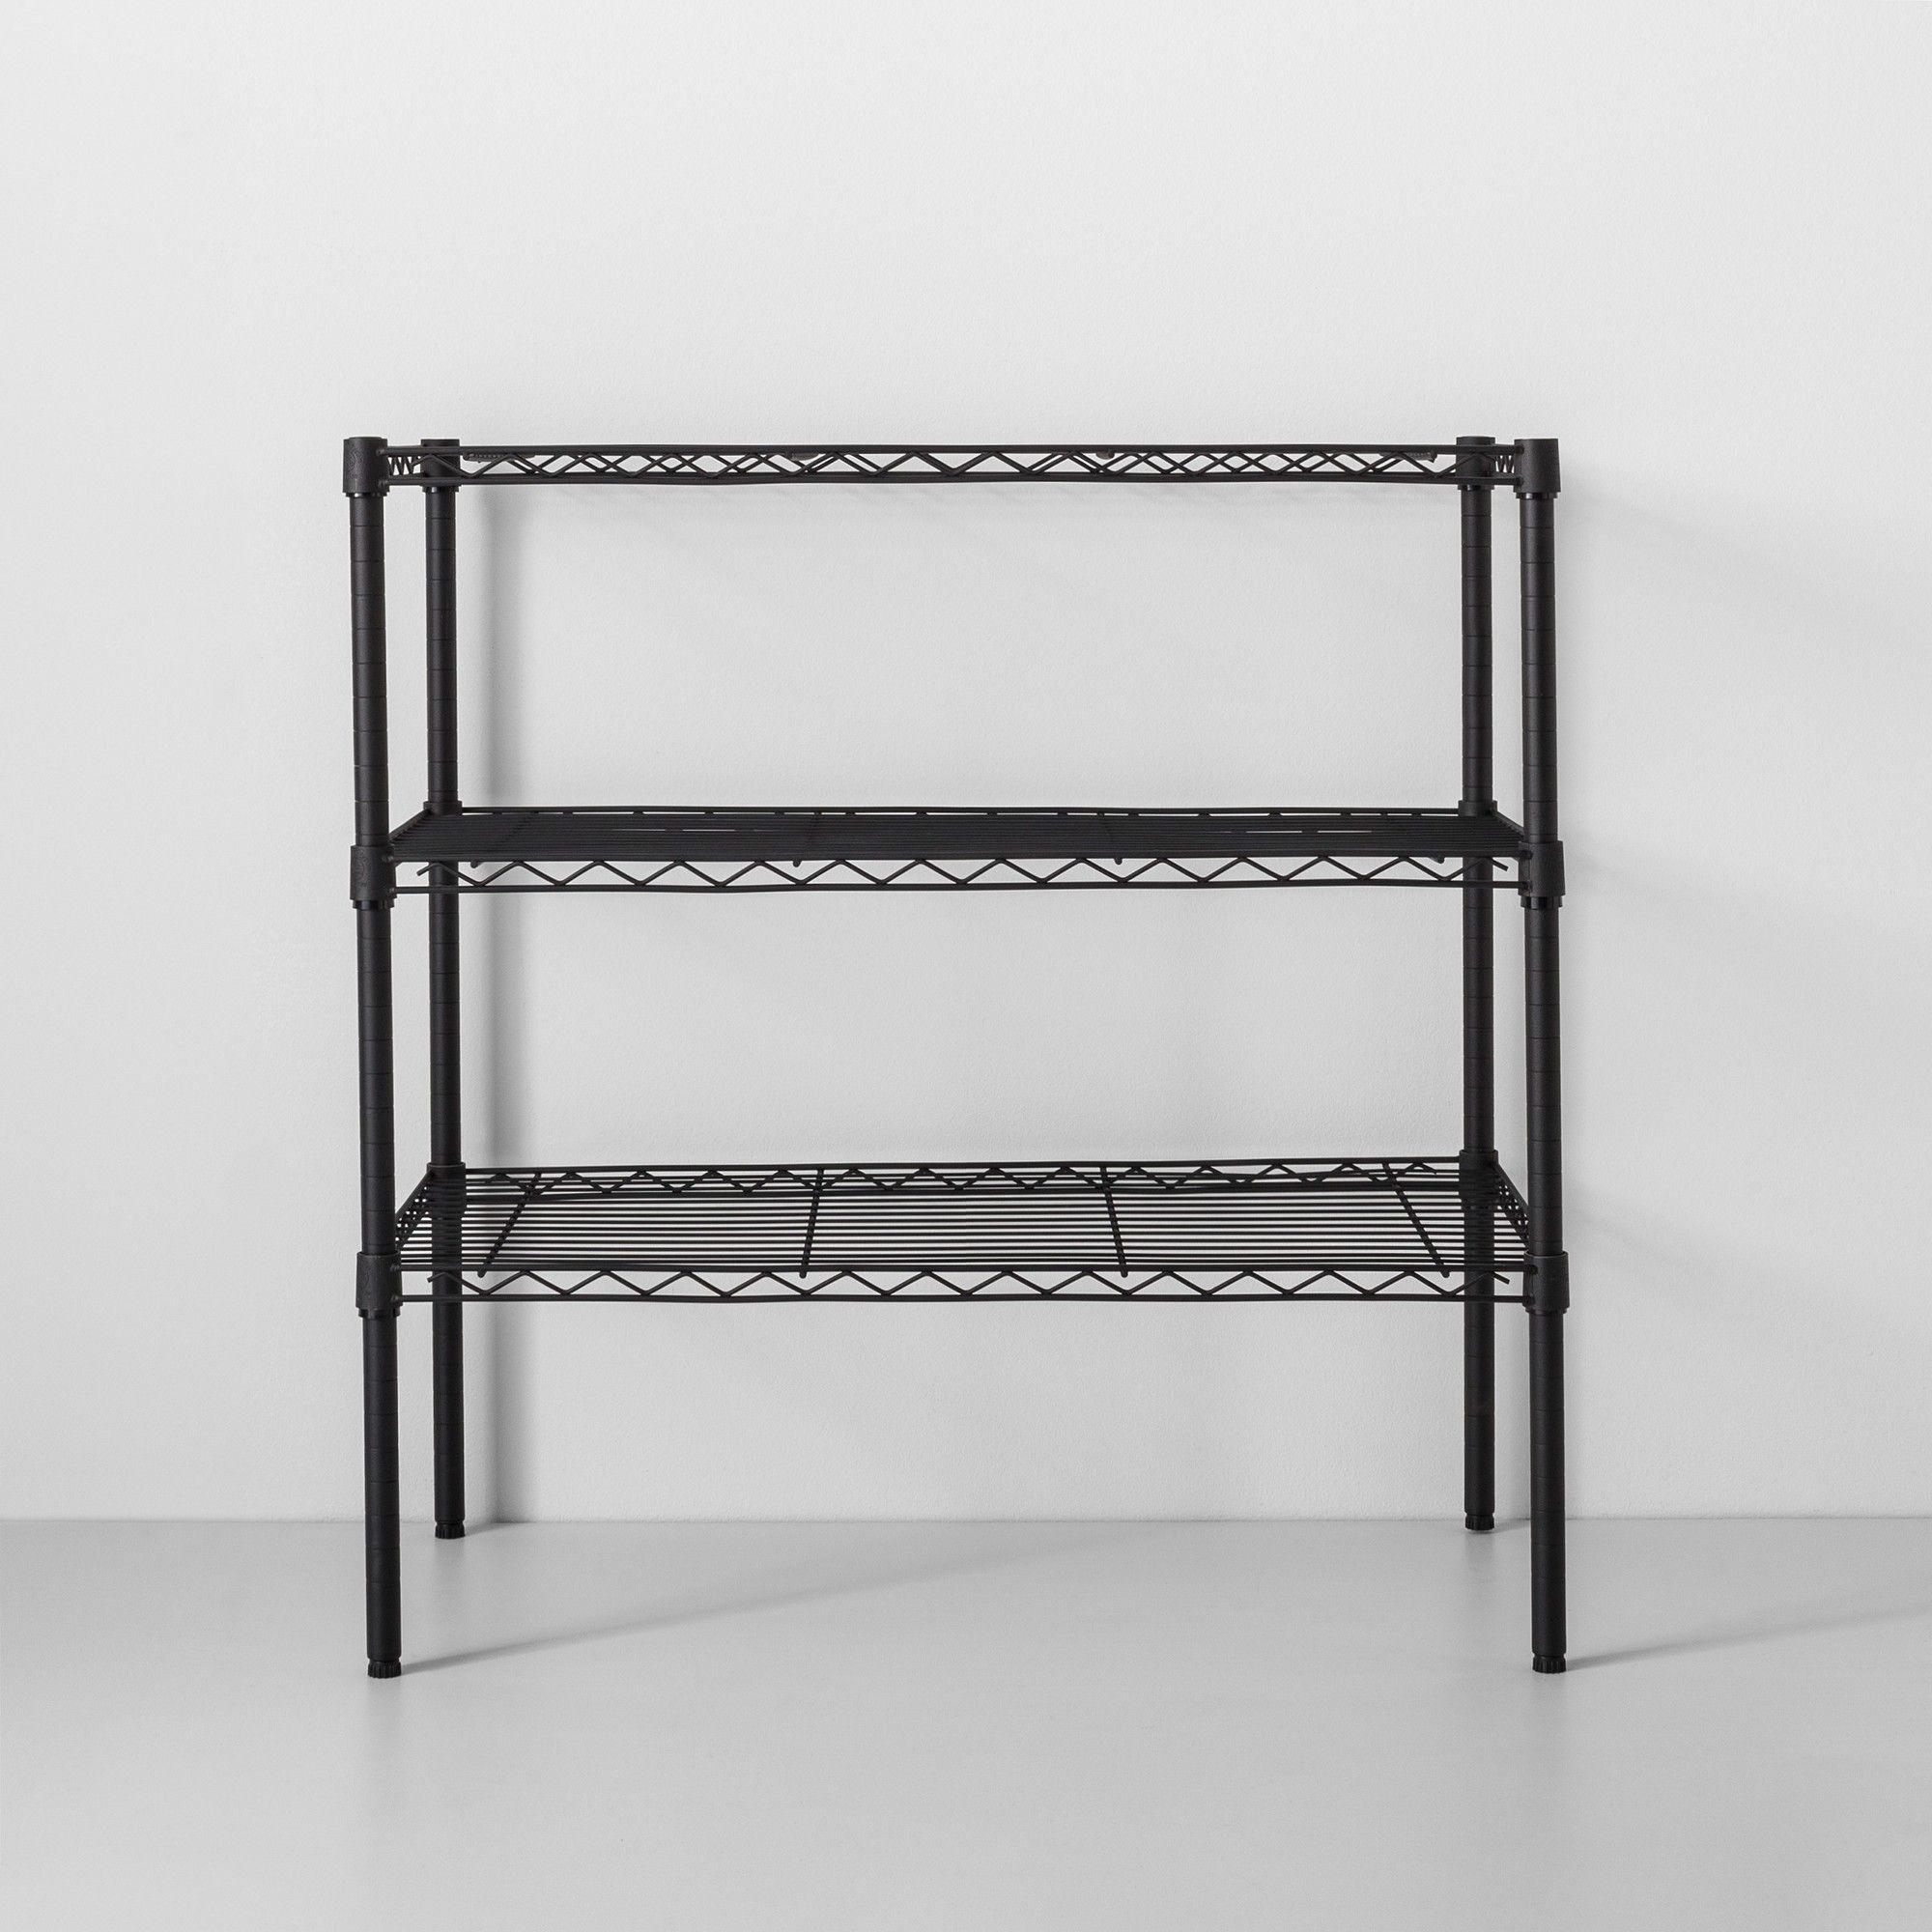 3 Tier Wide Wire Shelf Black - Made By Design™